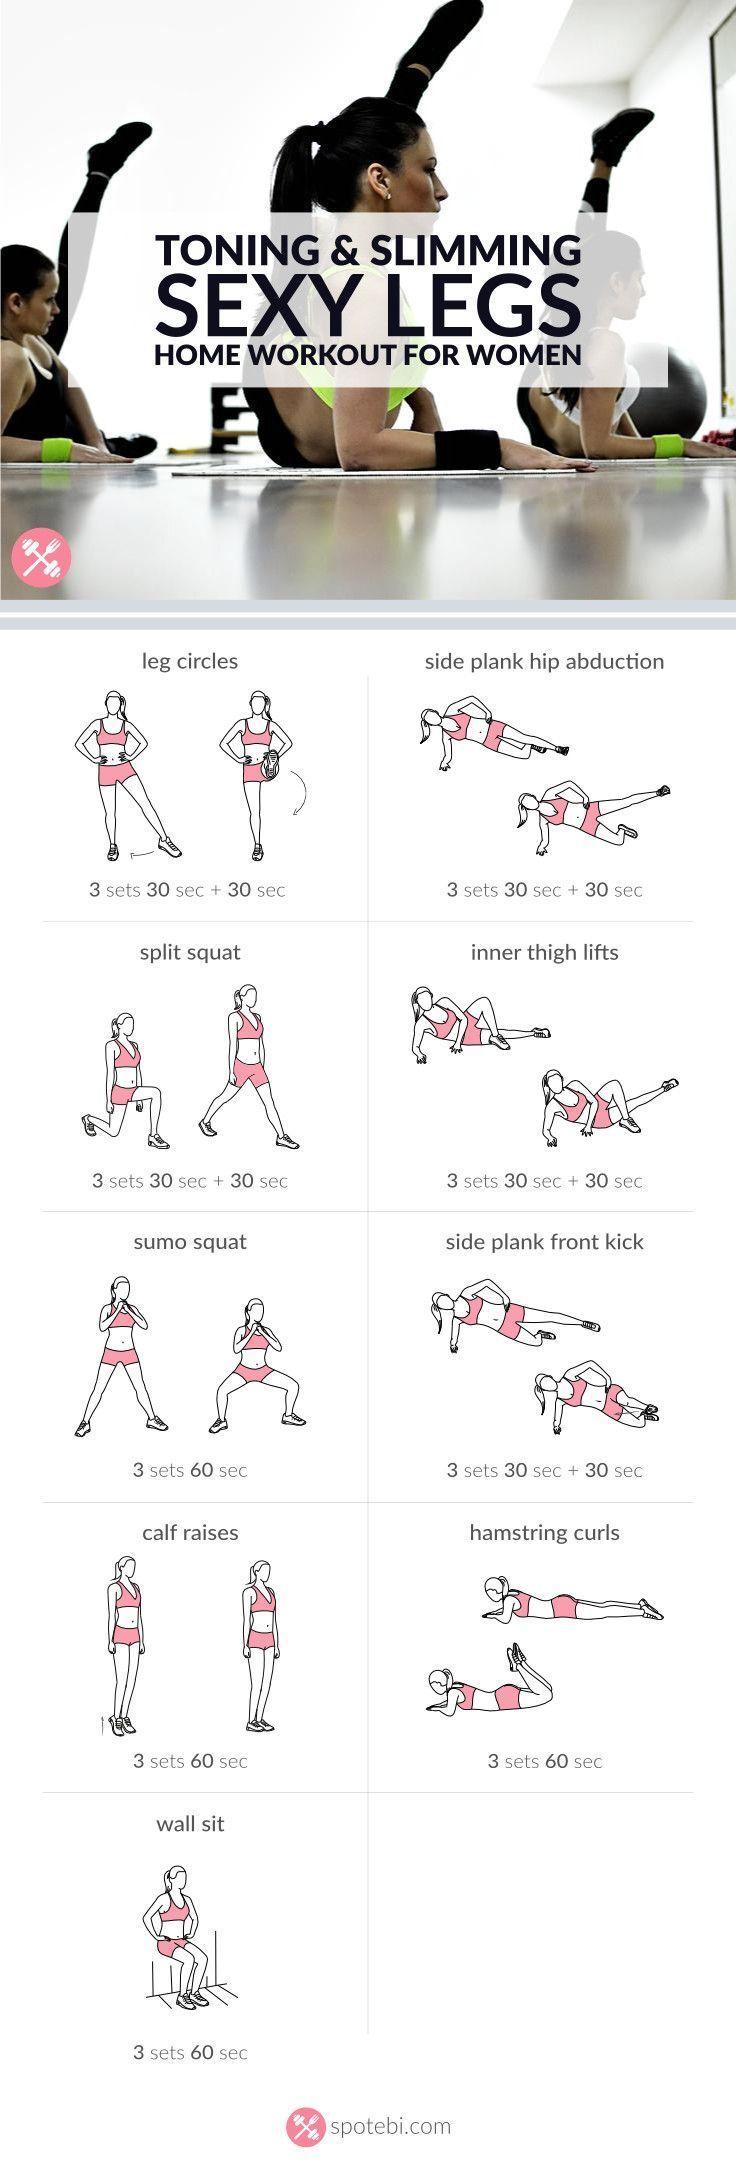 Best Leg Workout for Women!  find more relevant stuff: victoriajohnson.wordpress.com